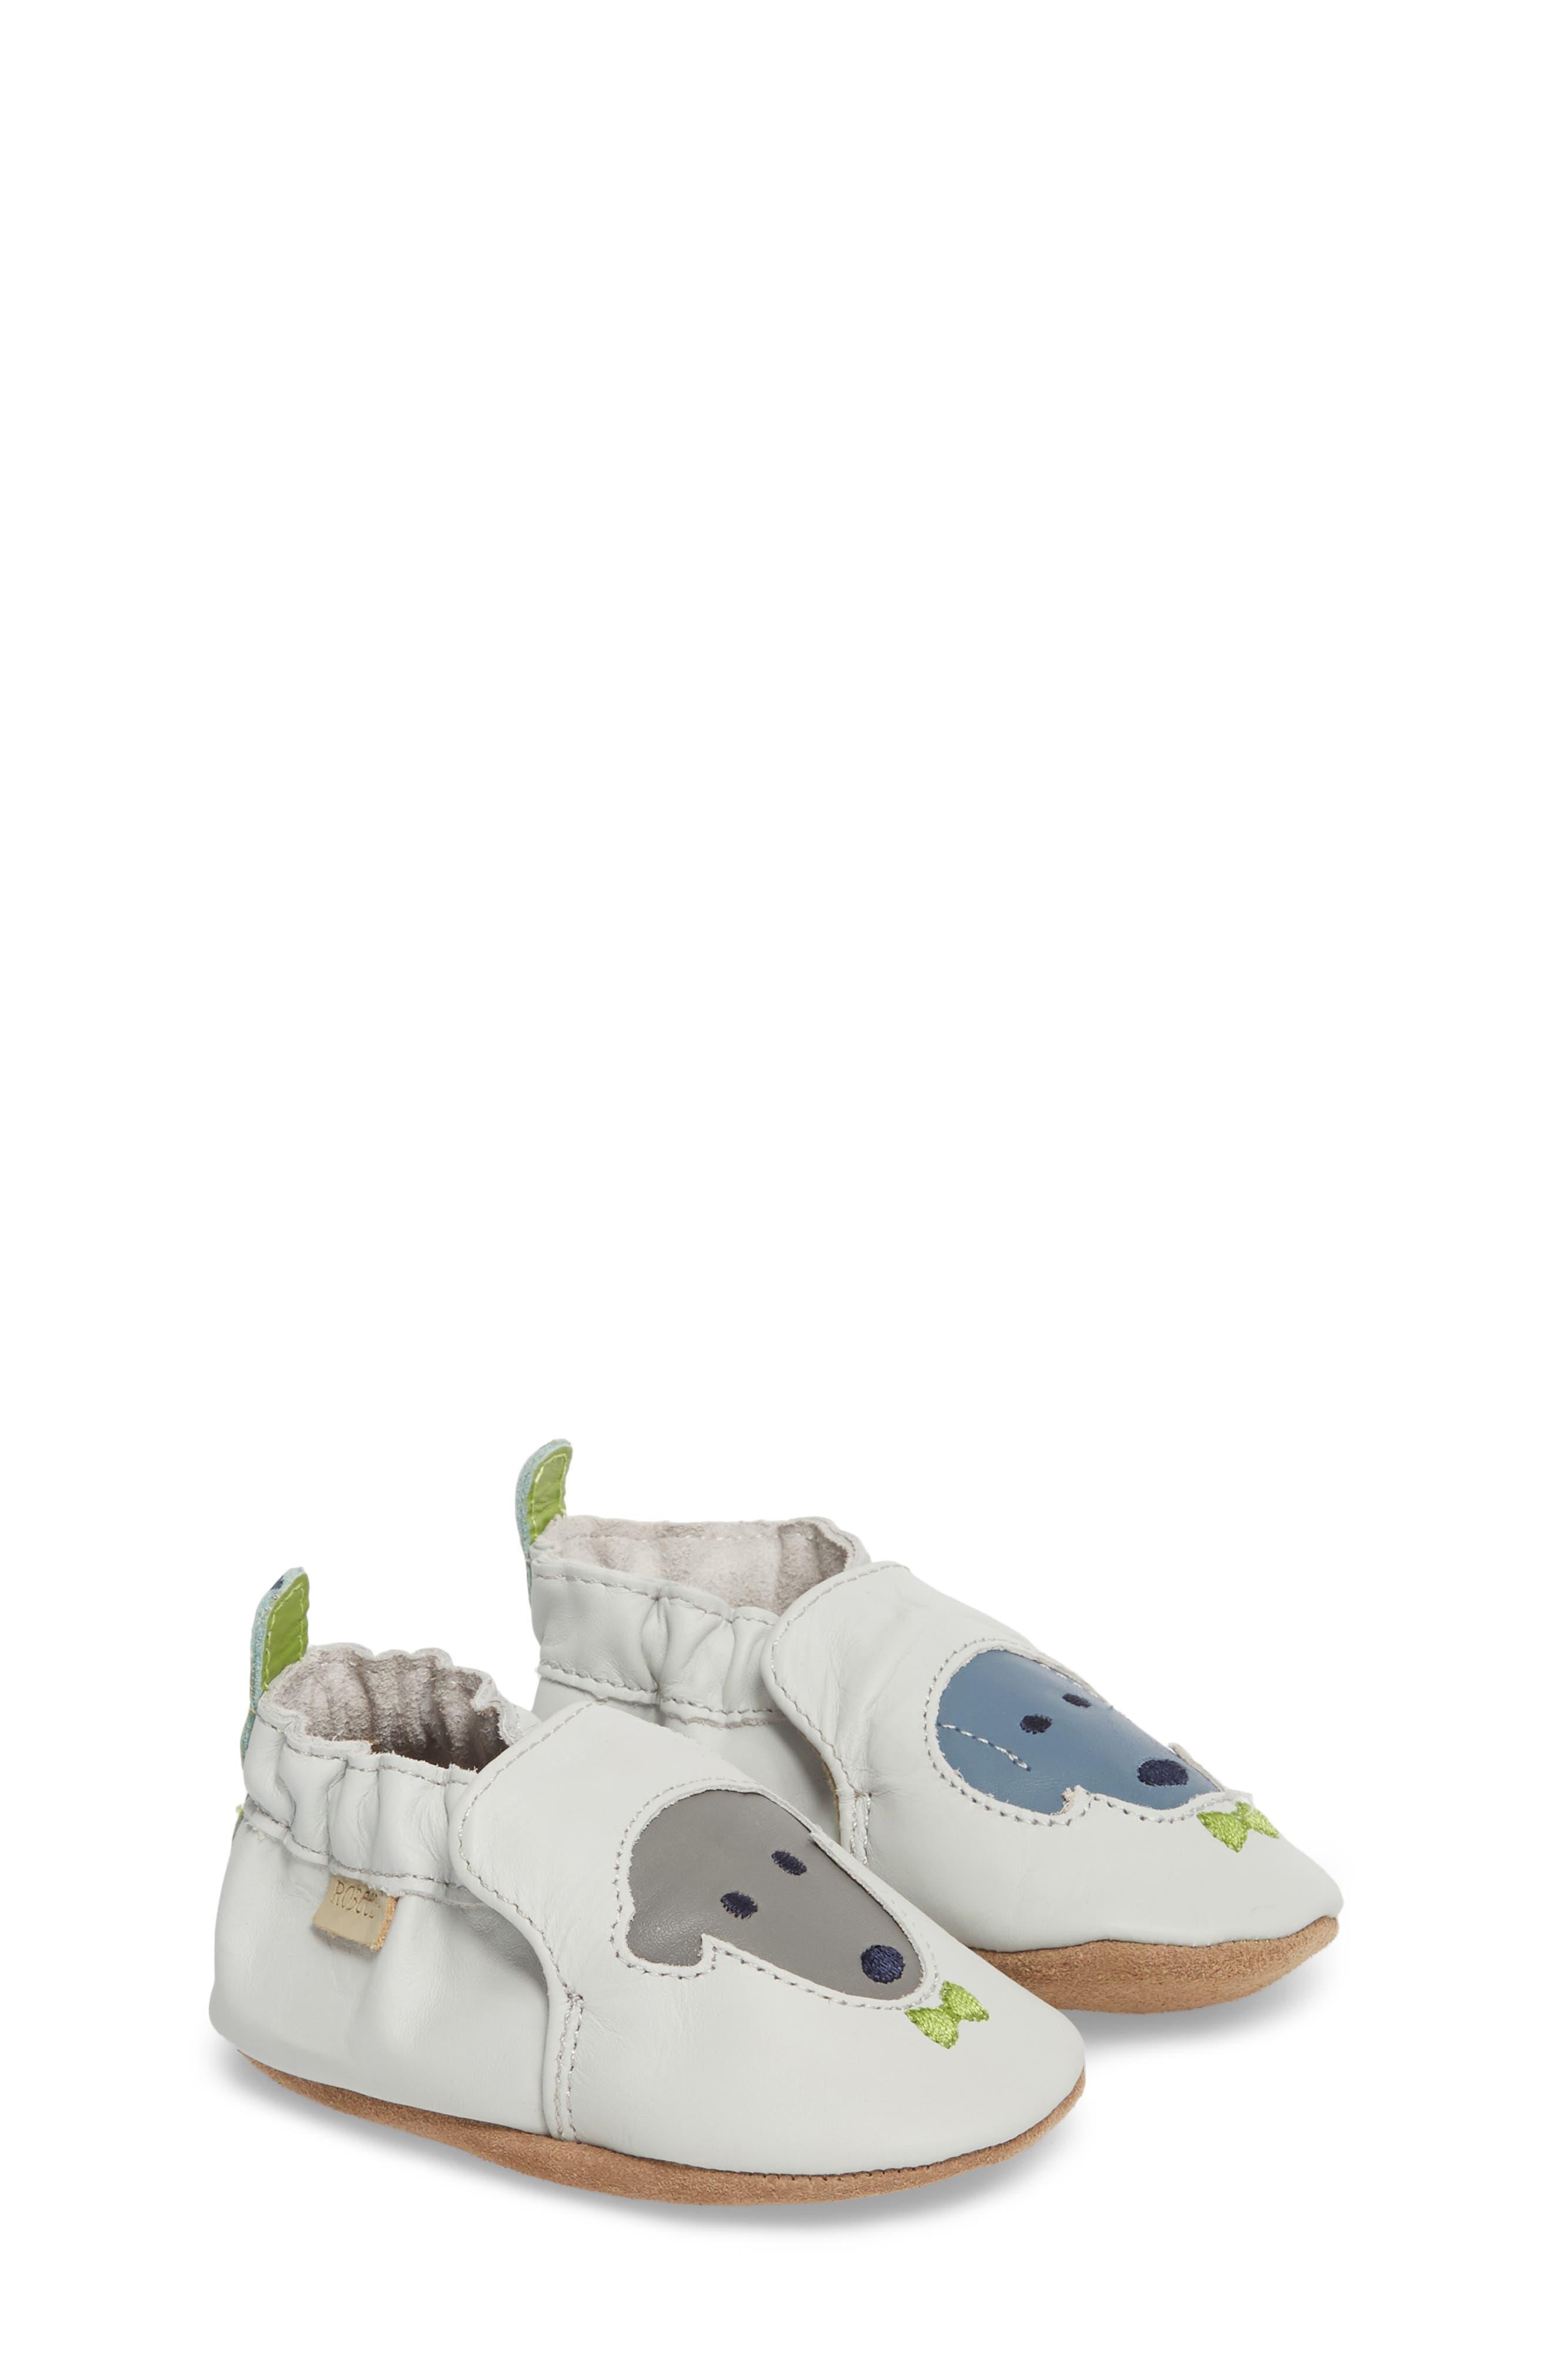 Dog Buddies Moccasin Crib Shoe,                             Alternate thumbnail 3, color,                             Light Grey